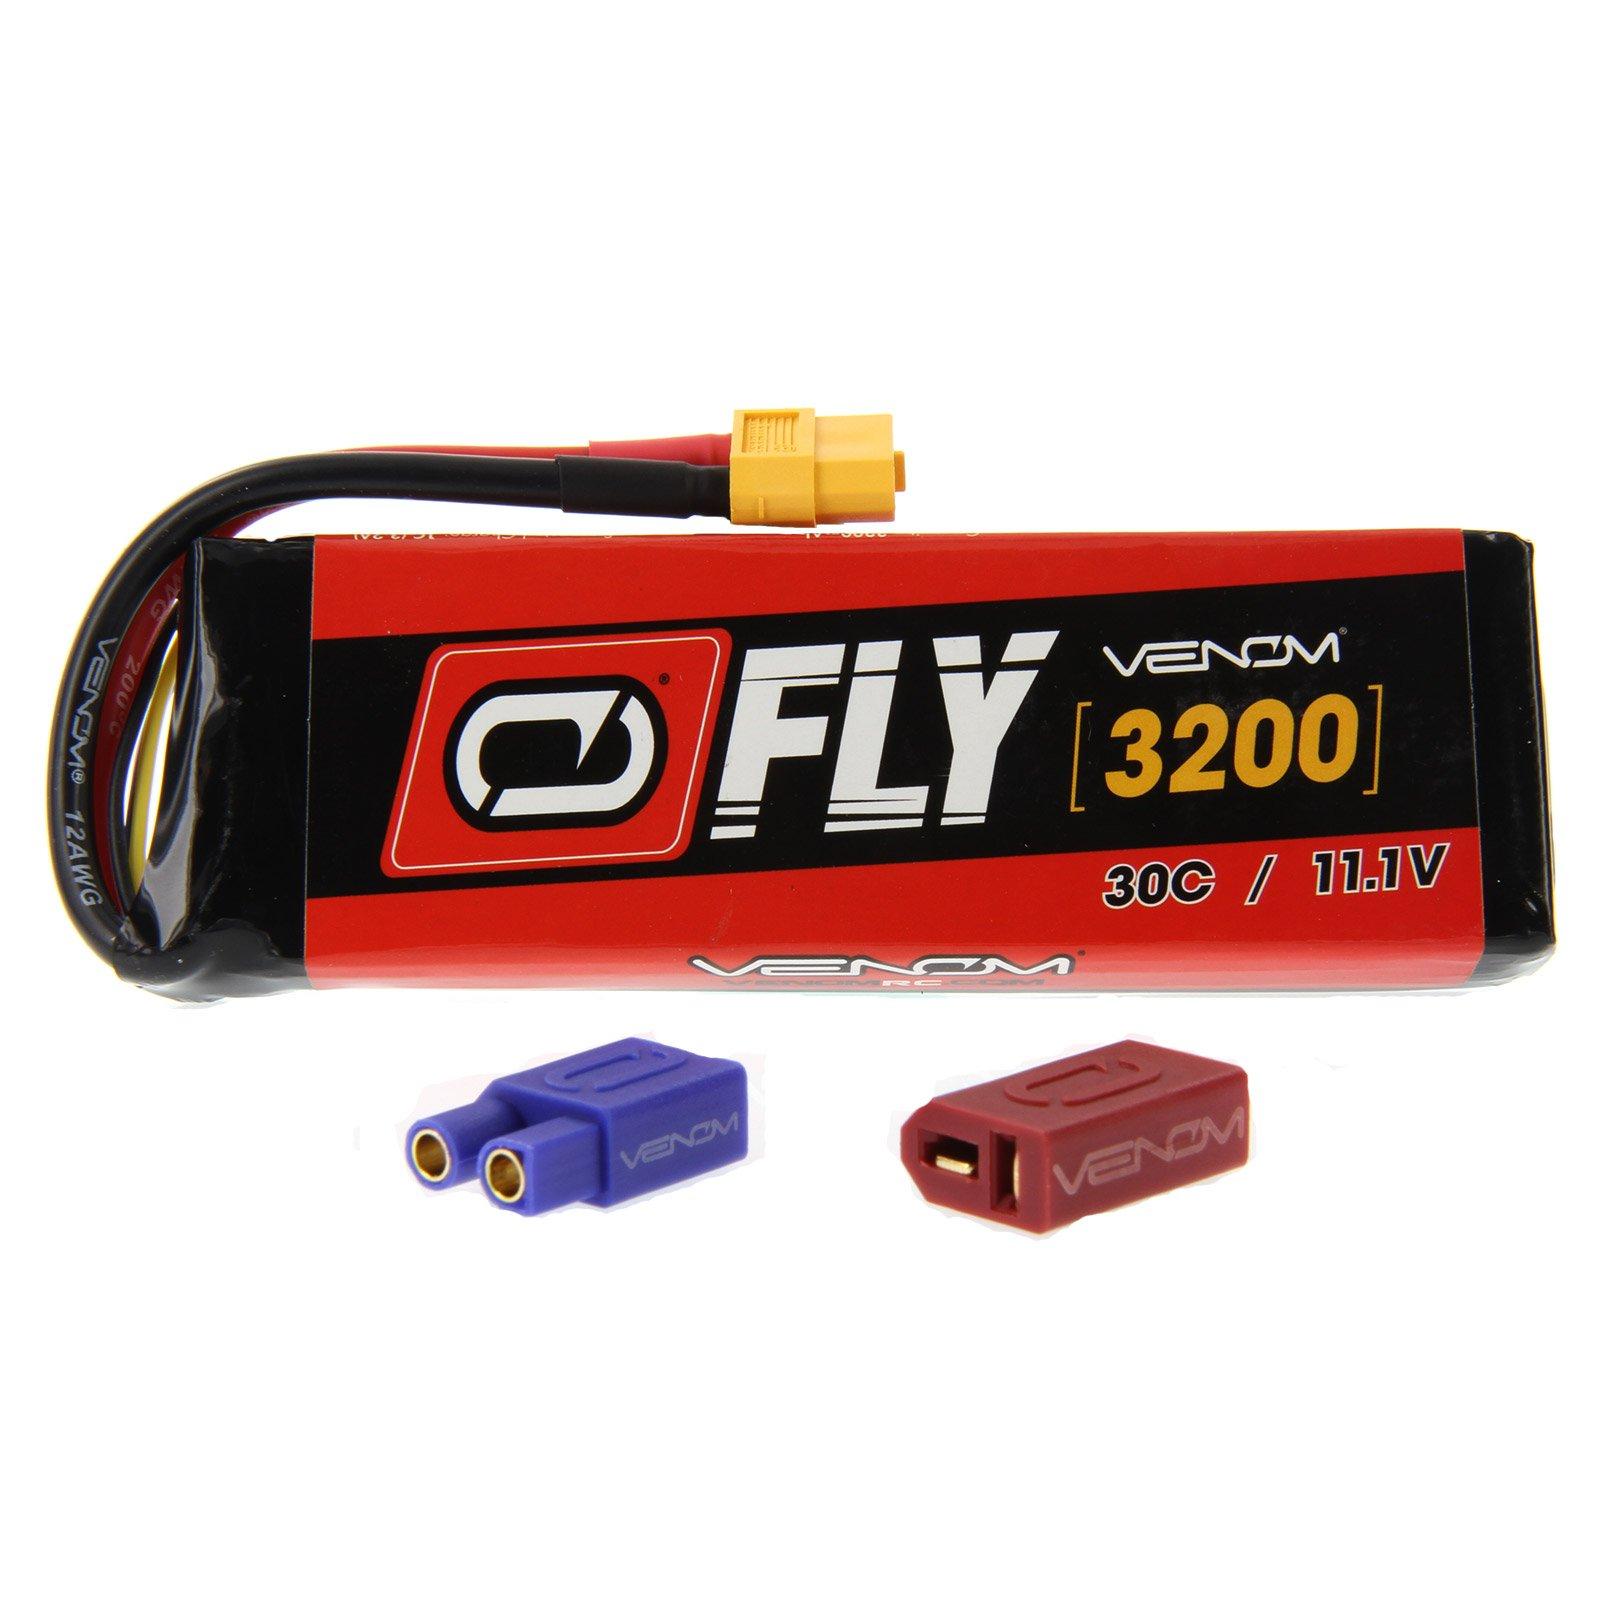 Venom Fly 30C 3S 3200mAh 11.1V LiPo Battery with UNI 2.0 Plug (XT60/Deans/EC3) - Compare to E-flite EFLB32003S